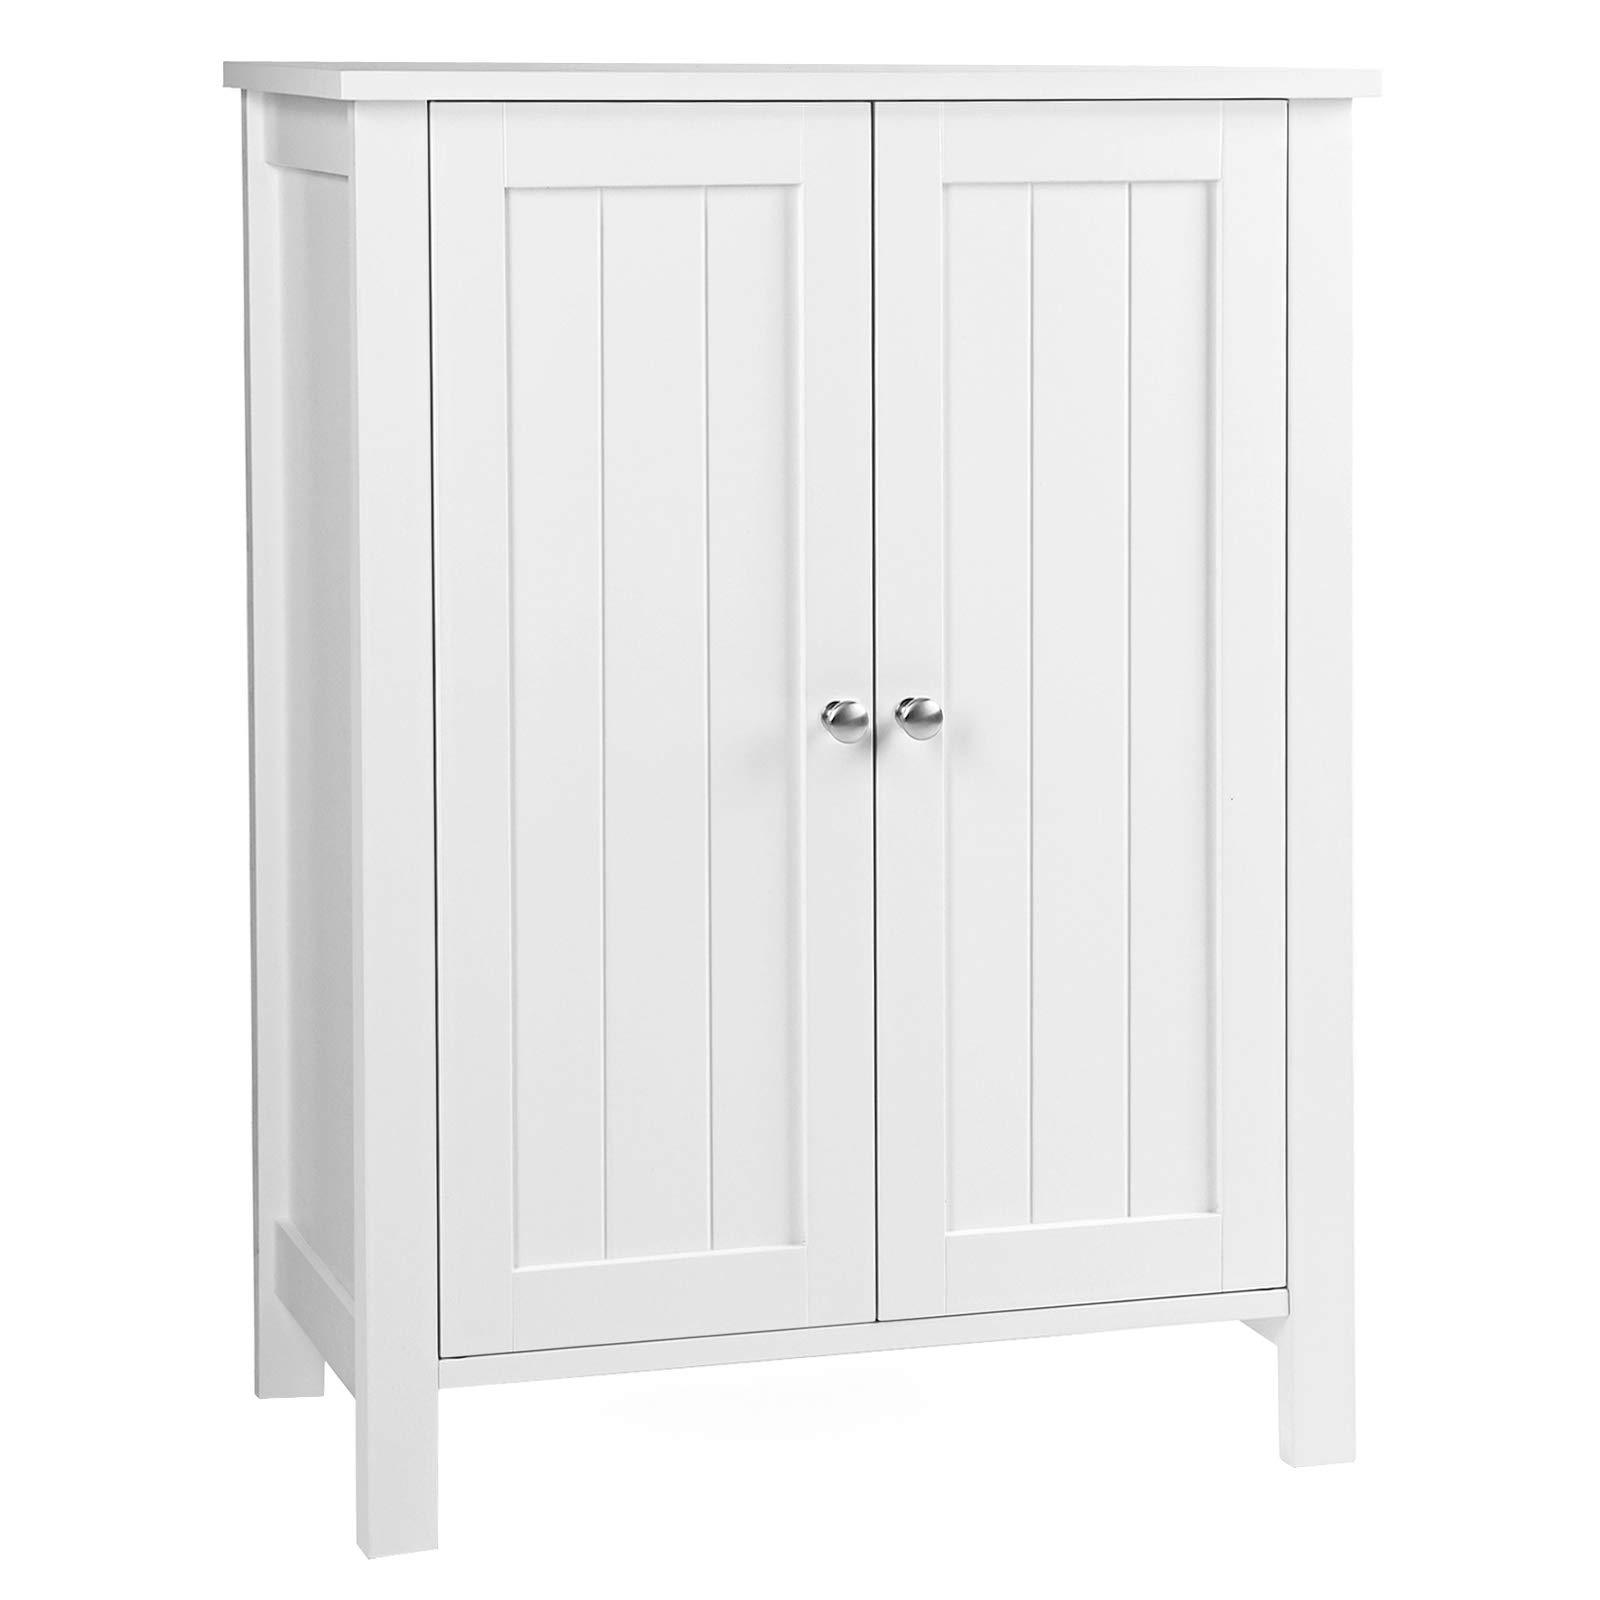 "VASAGLE UBCB60W Bathroom Floor Storage Cabinet with Double Door Adjustable Shelf, 23.6""L x 11.8""W x 31.5""H White"